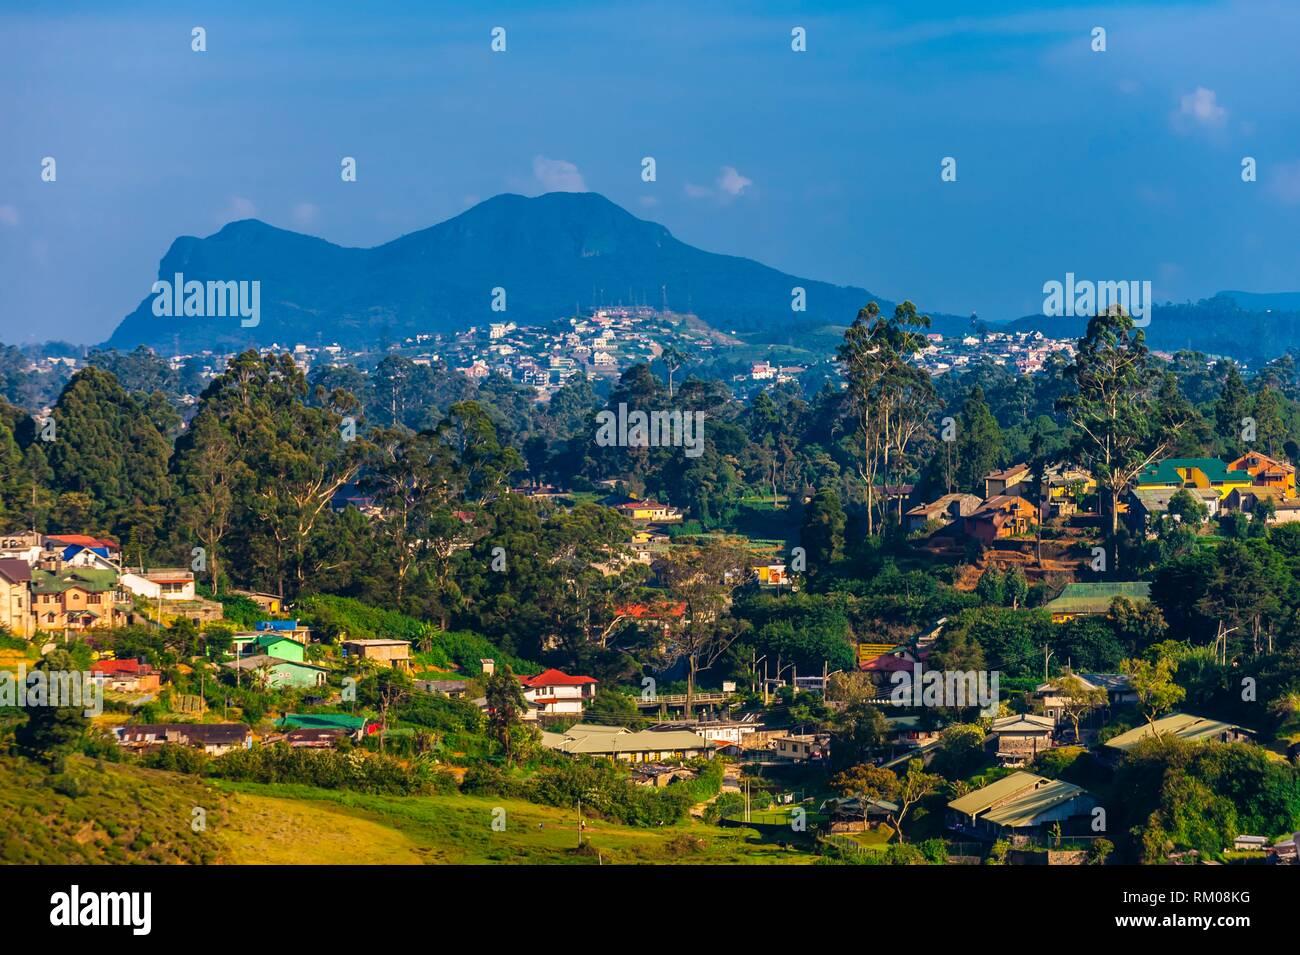 Nuwara Eliya, Central Province, Sri Lanka. Stock Photo